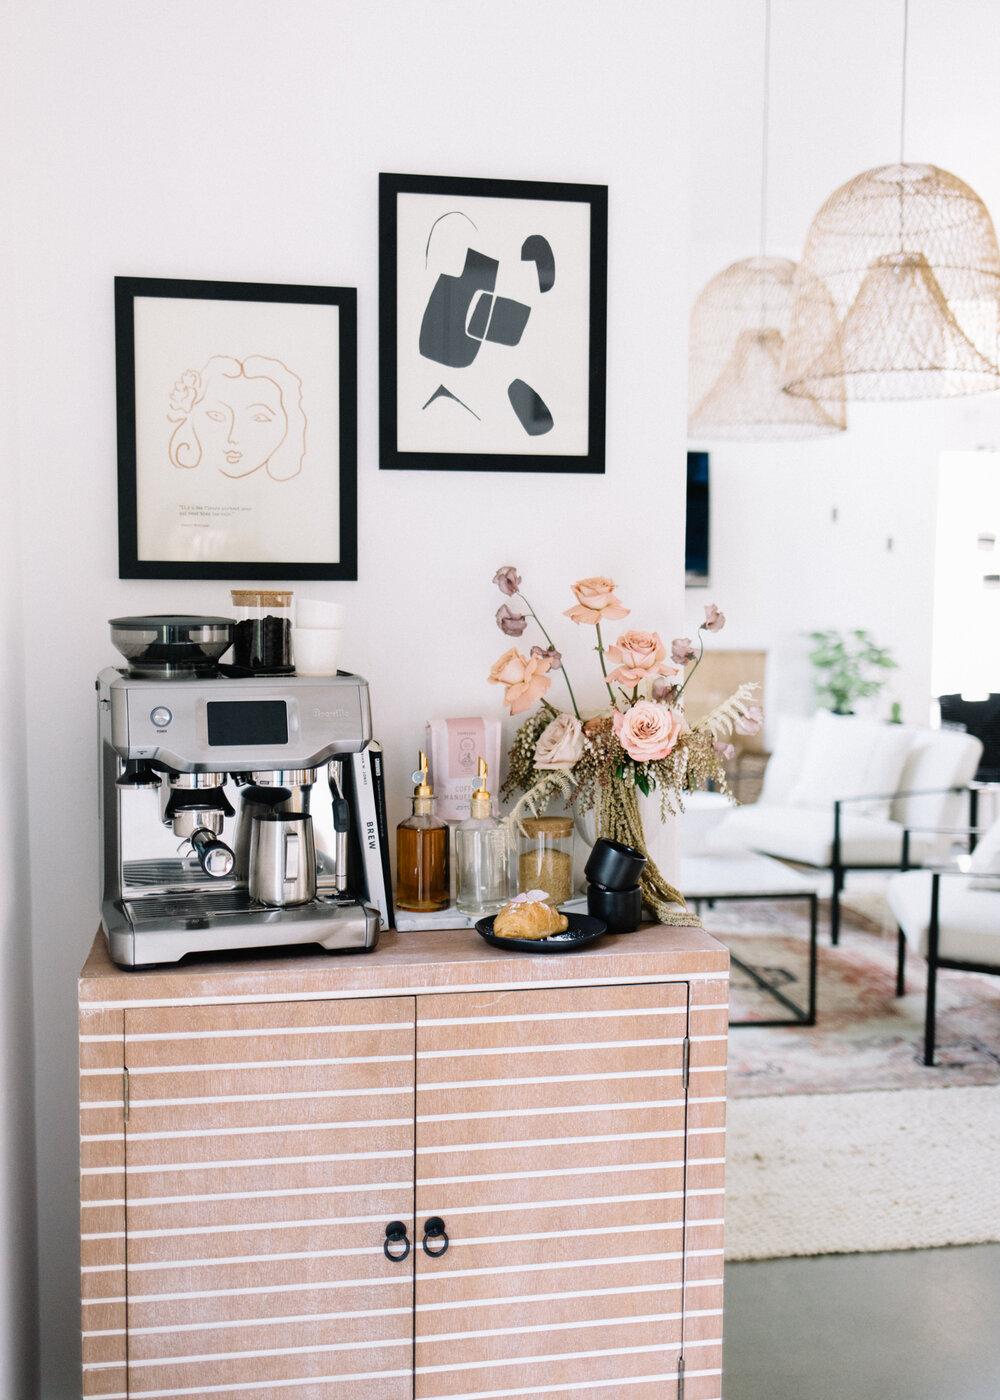 Home Renovation — A Fabulous Fete Blog / All Categories — Lauren Saylor     Stationery • Interiors • Design